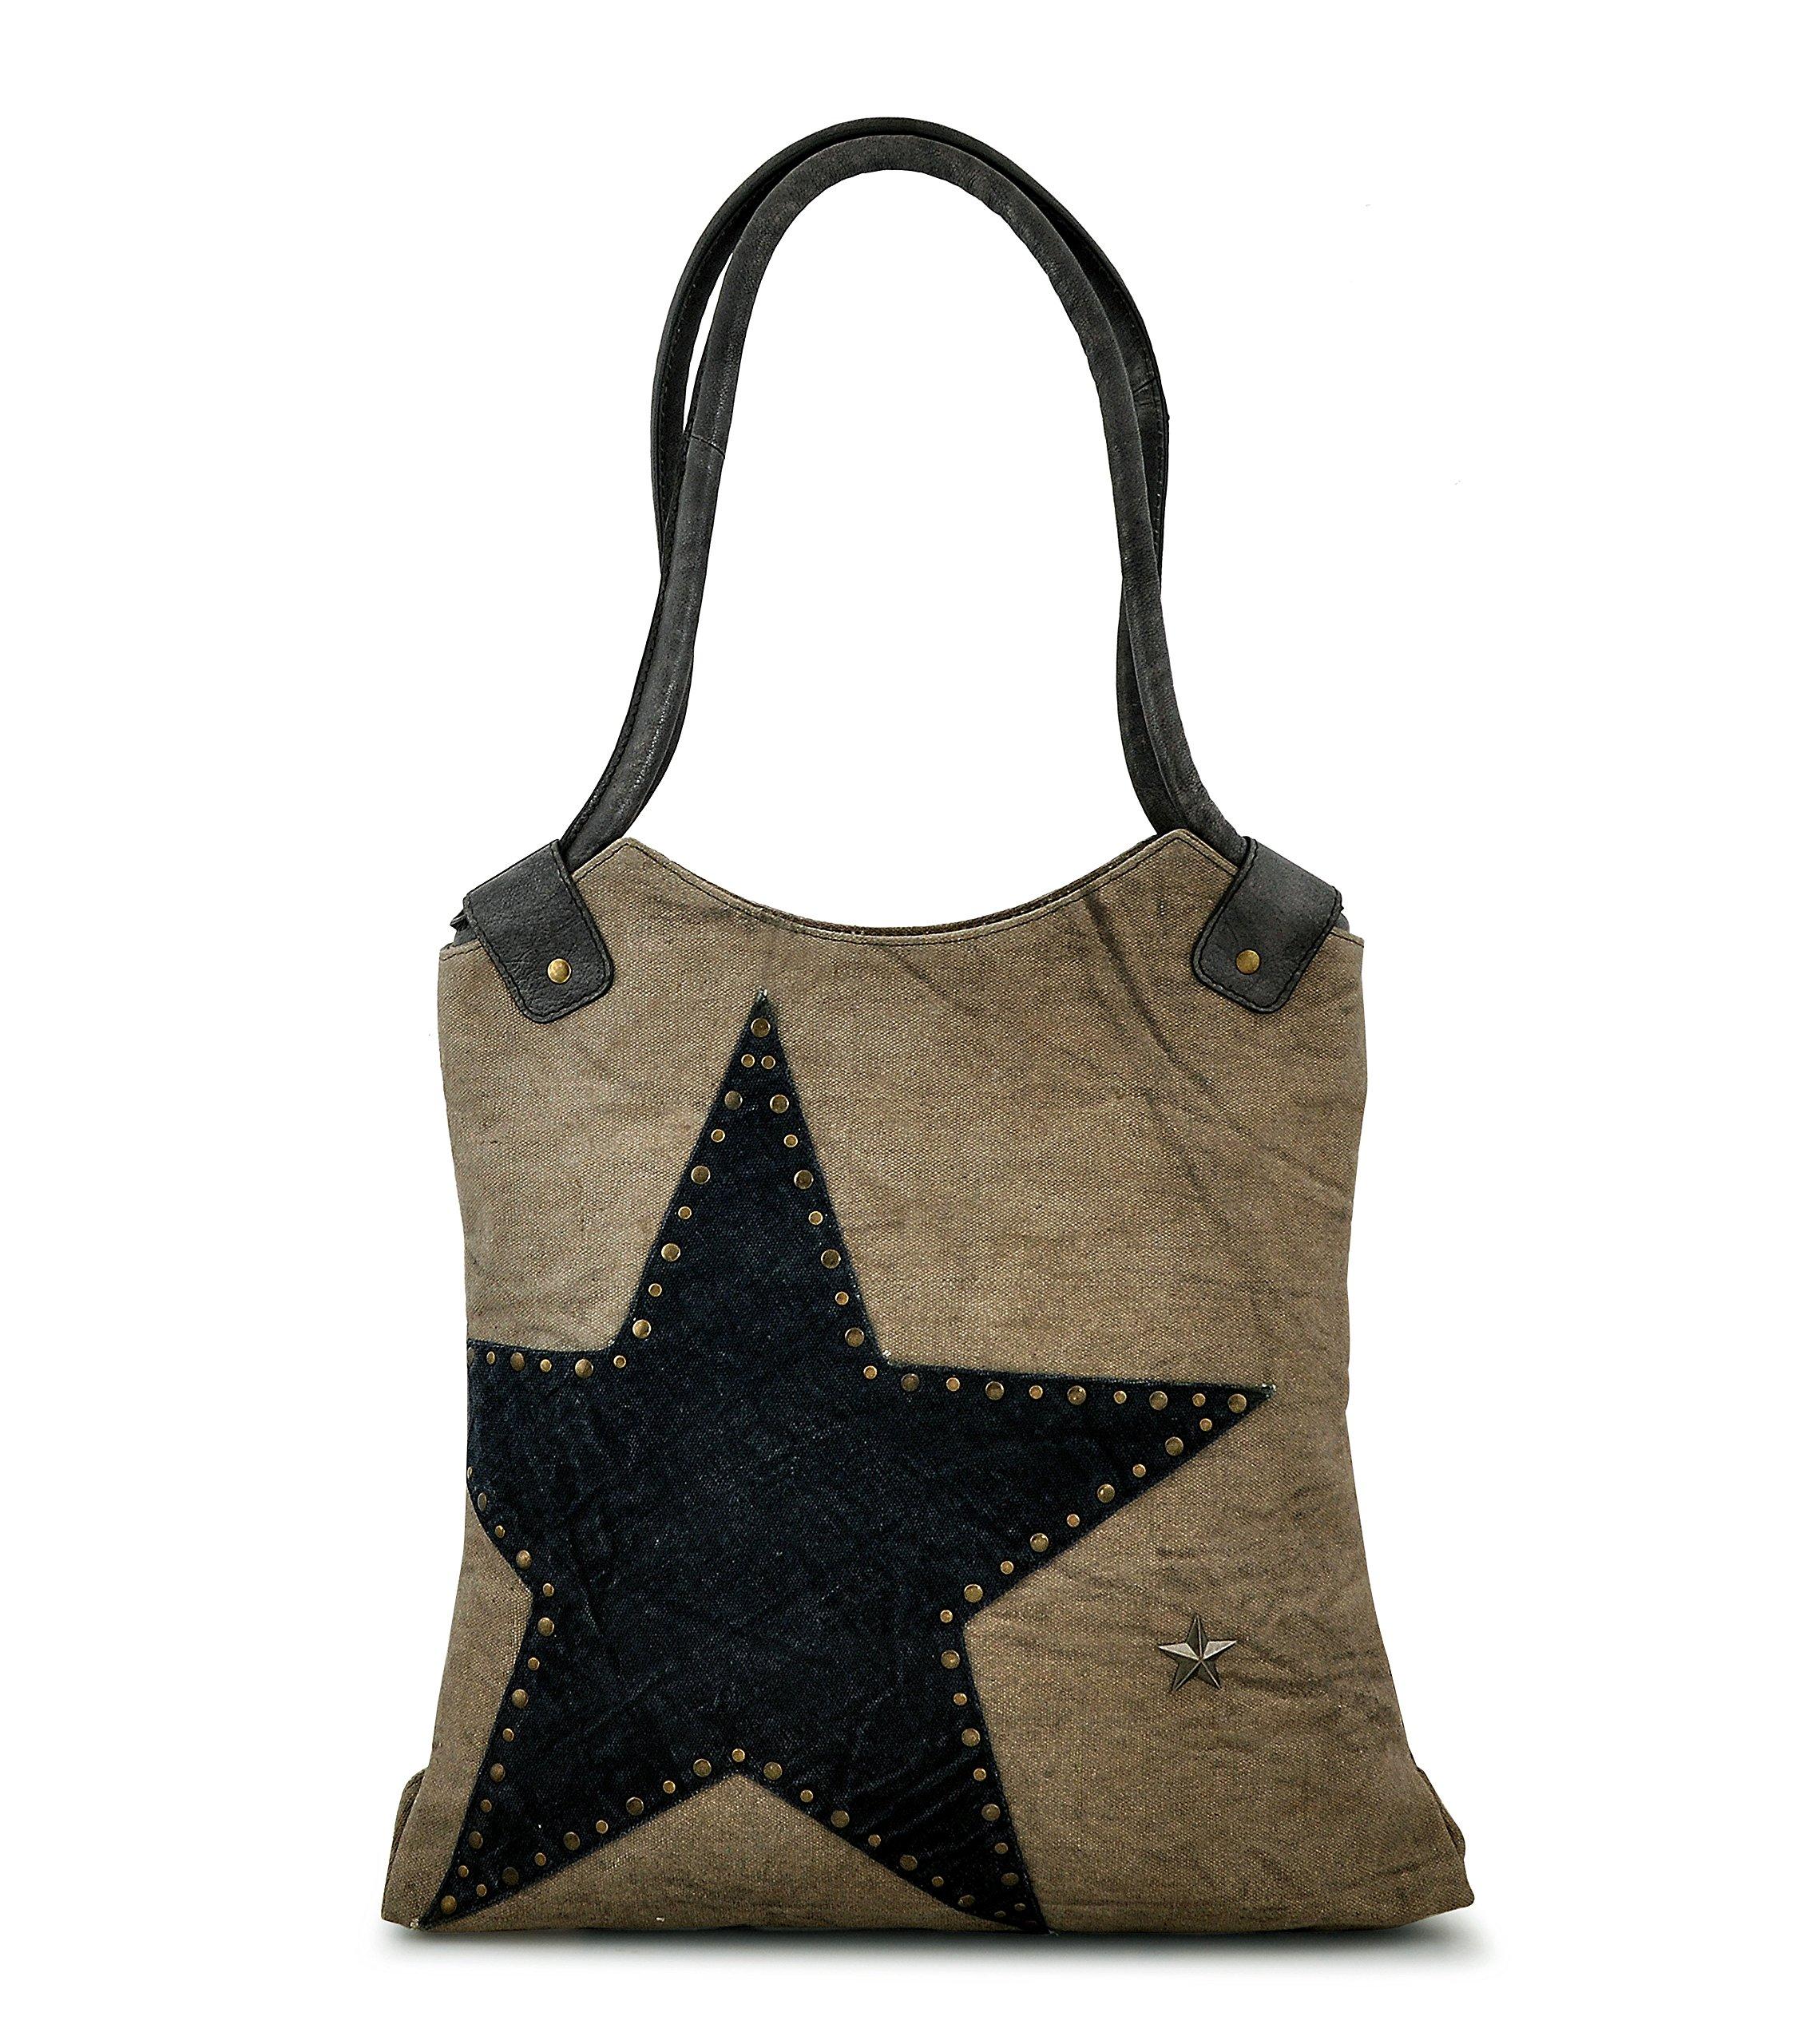 Canvas Tote bag for Women Girls Leather Trims Work Travel Shopper Backpack Cross body Hobo Messenger Shoulder Purse by Daphne (Big Star)